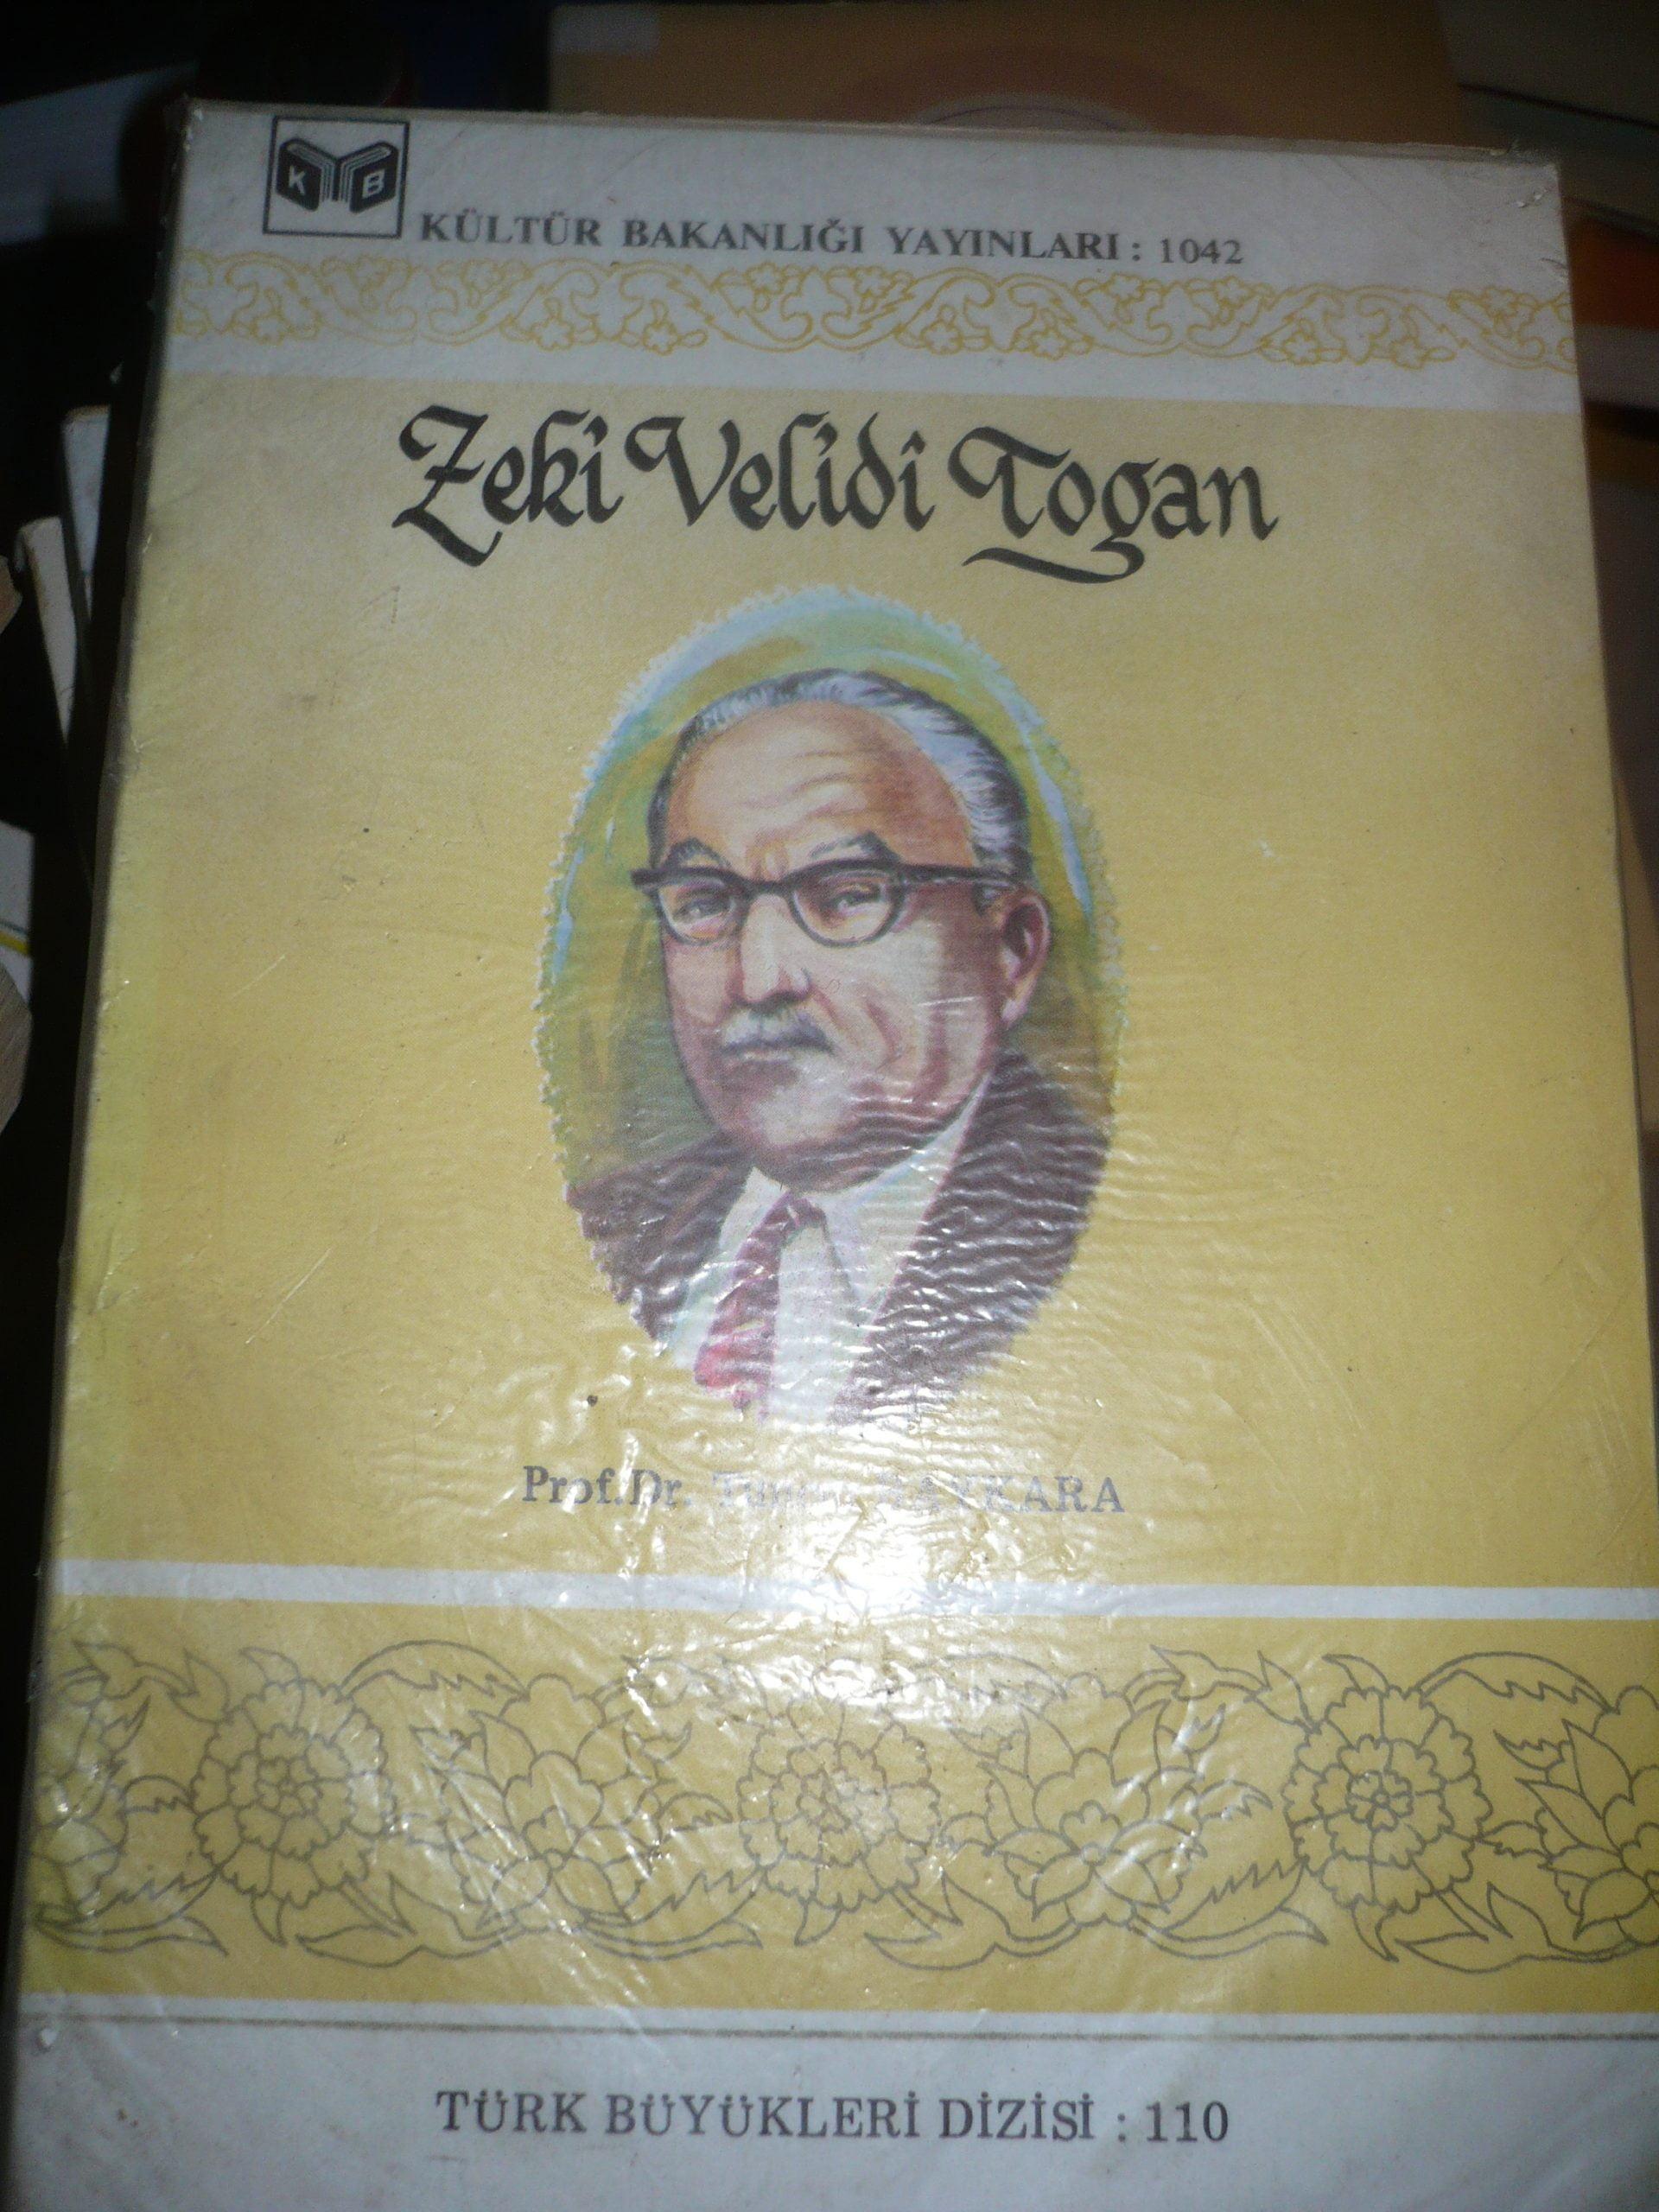 ZEKİ VELİDİ TOGAN/Prof.Dr.Tuncer BAYKARA/10 TL